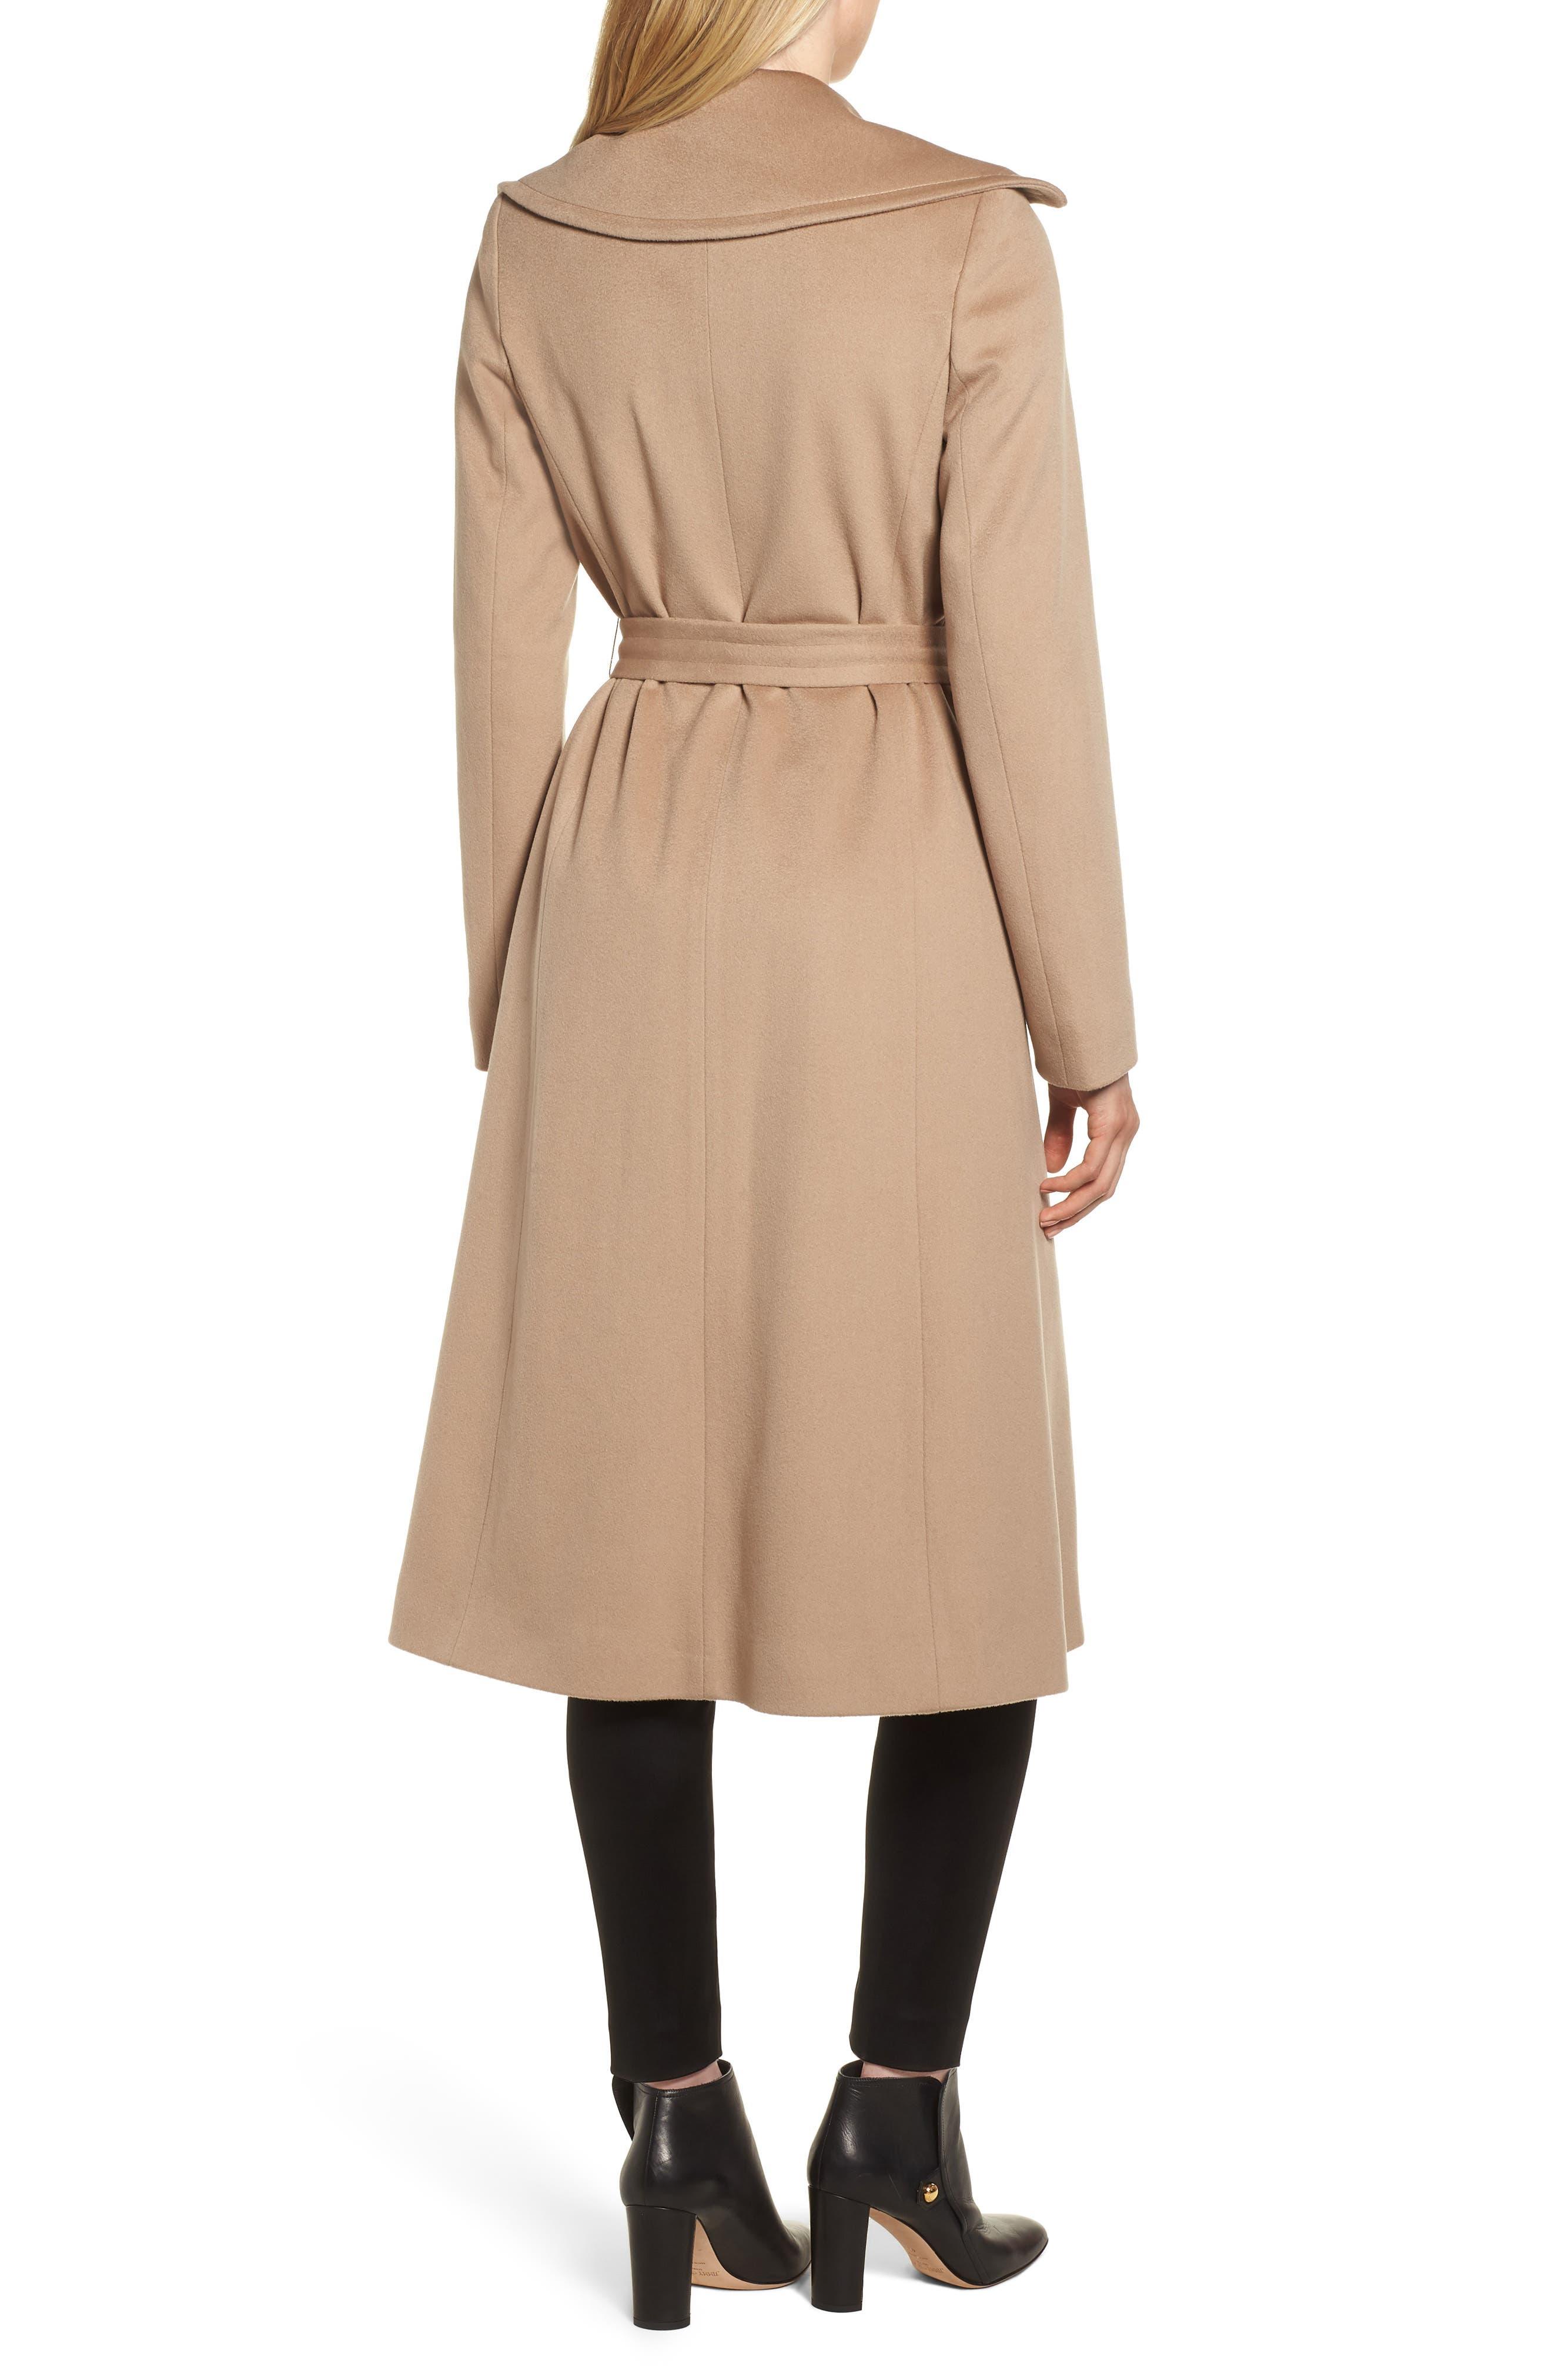 FLEURETTE,                             Loro Piana Wool Wrap Coat,                             Alternate thumbnail 2, color,                             CAMEL